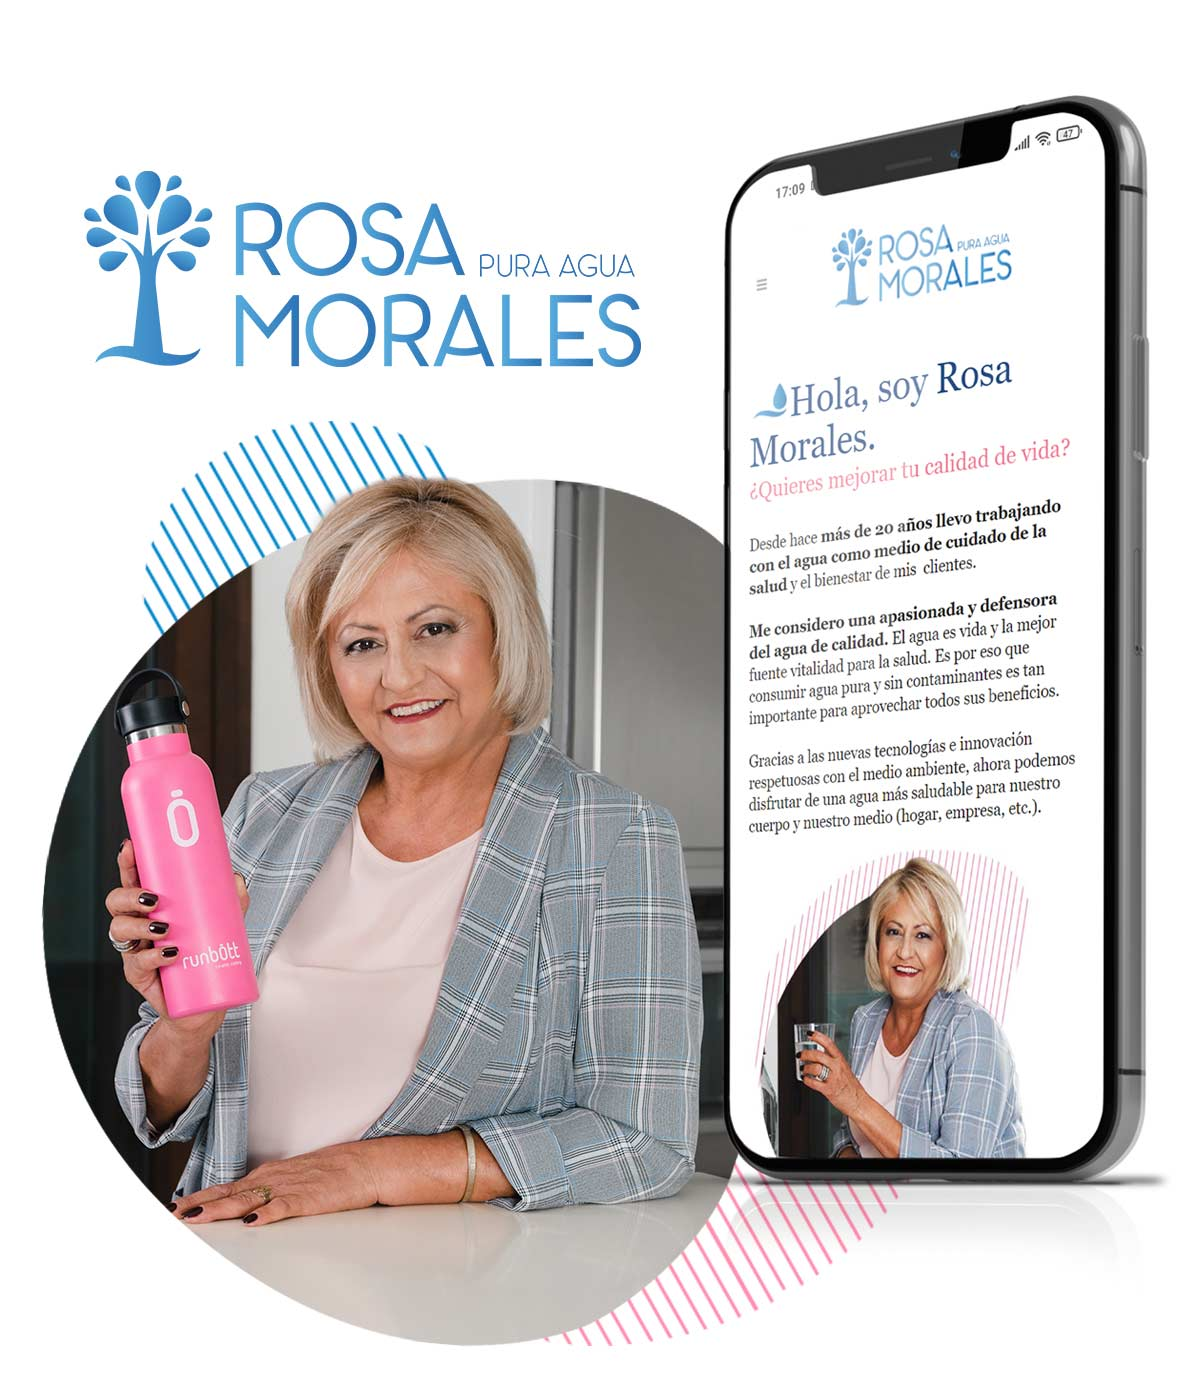 RosaMorales-Digitalizacion-Marca-Personal-2VM